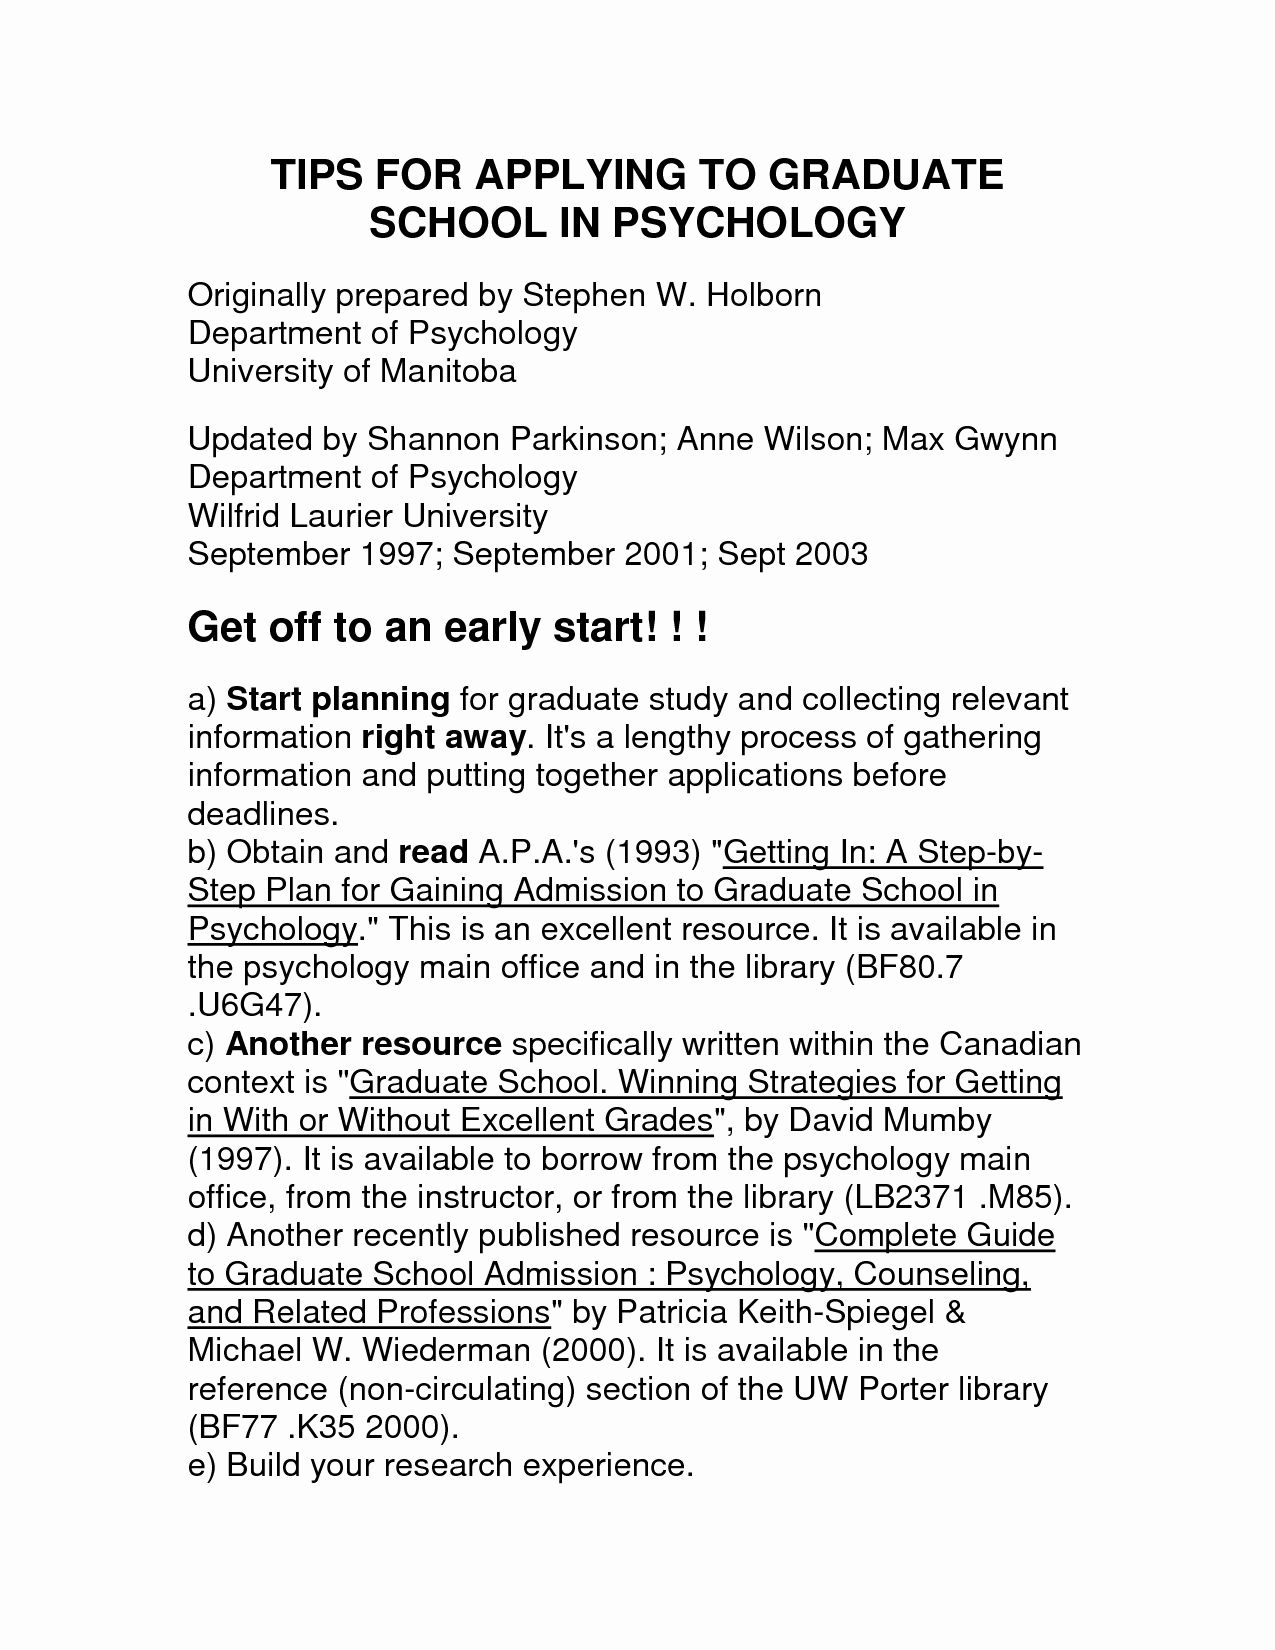 Resume for Grad School Example Inspirational Psychology